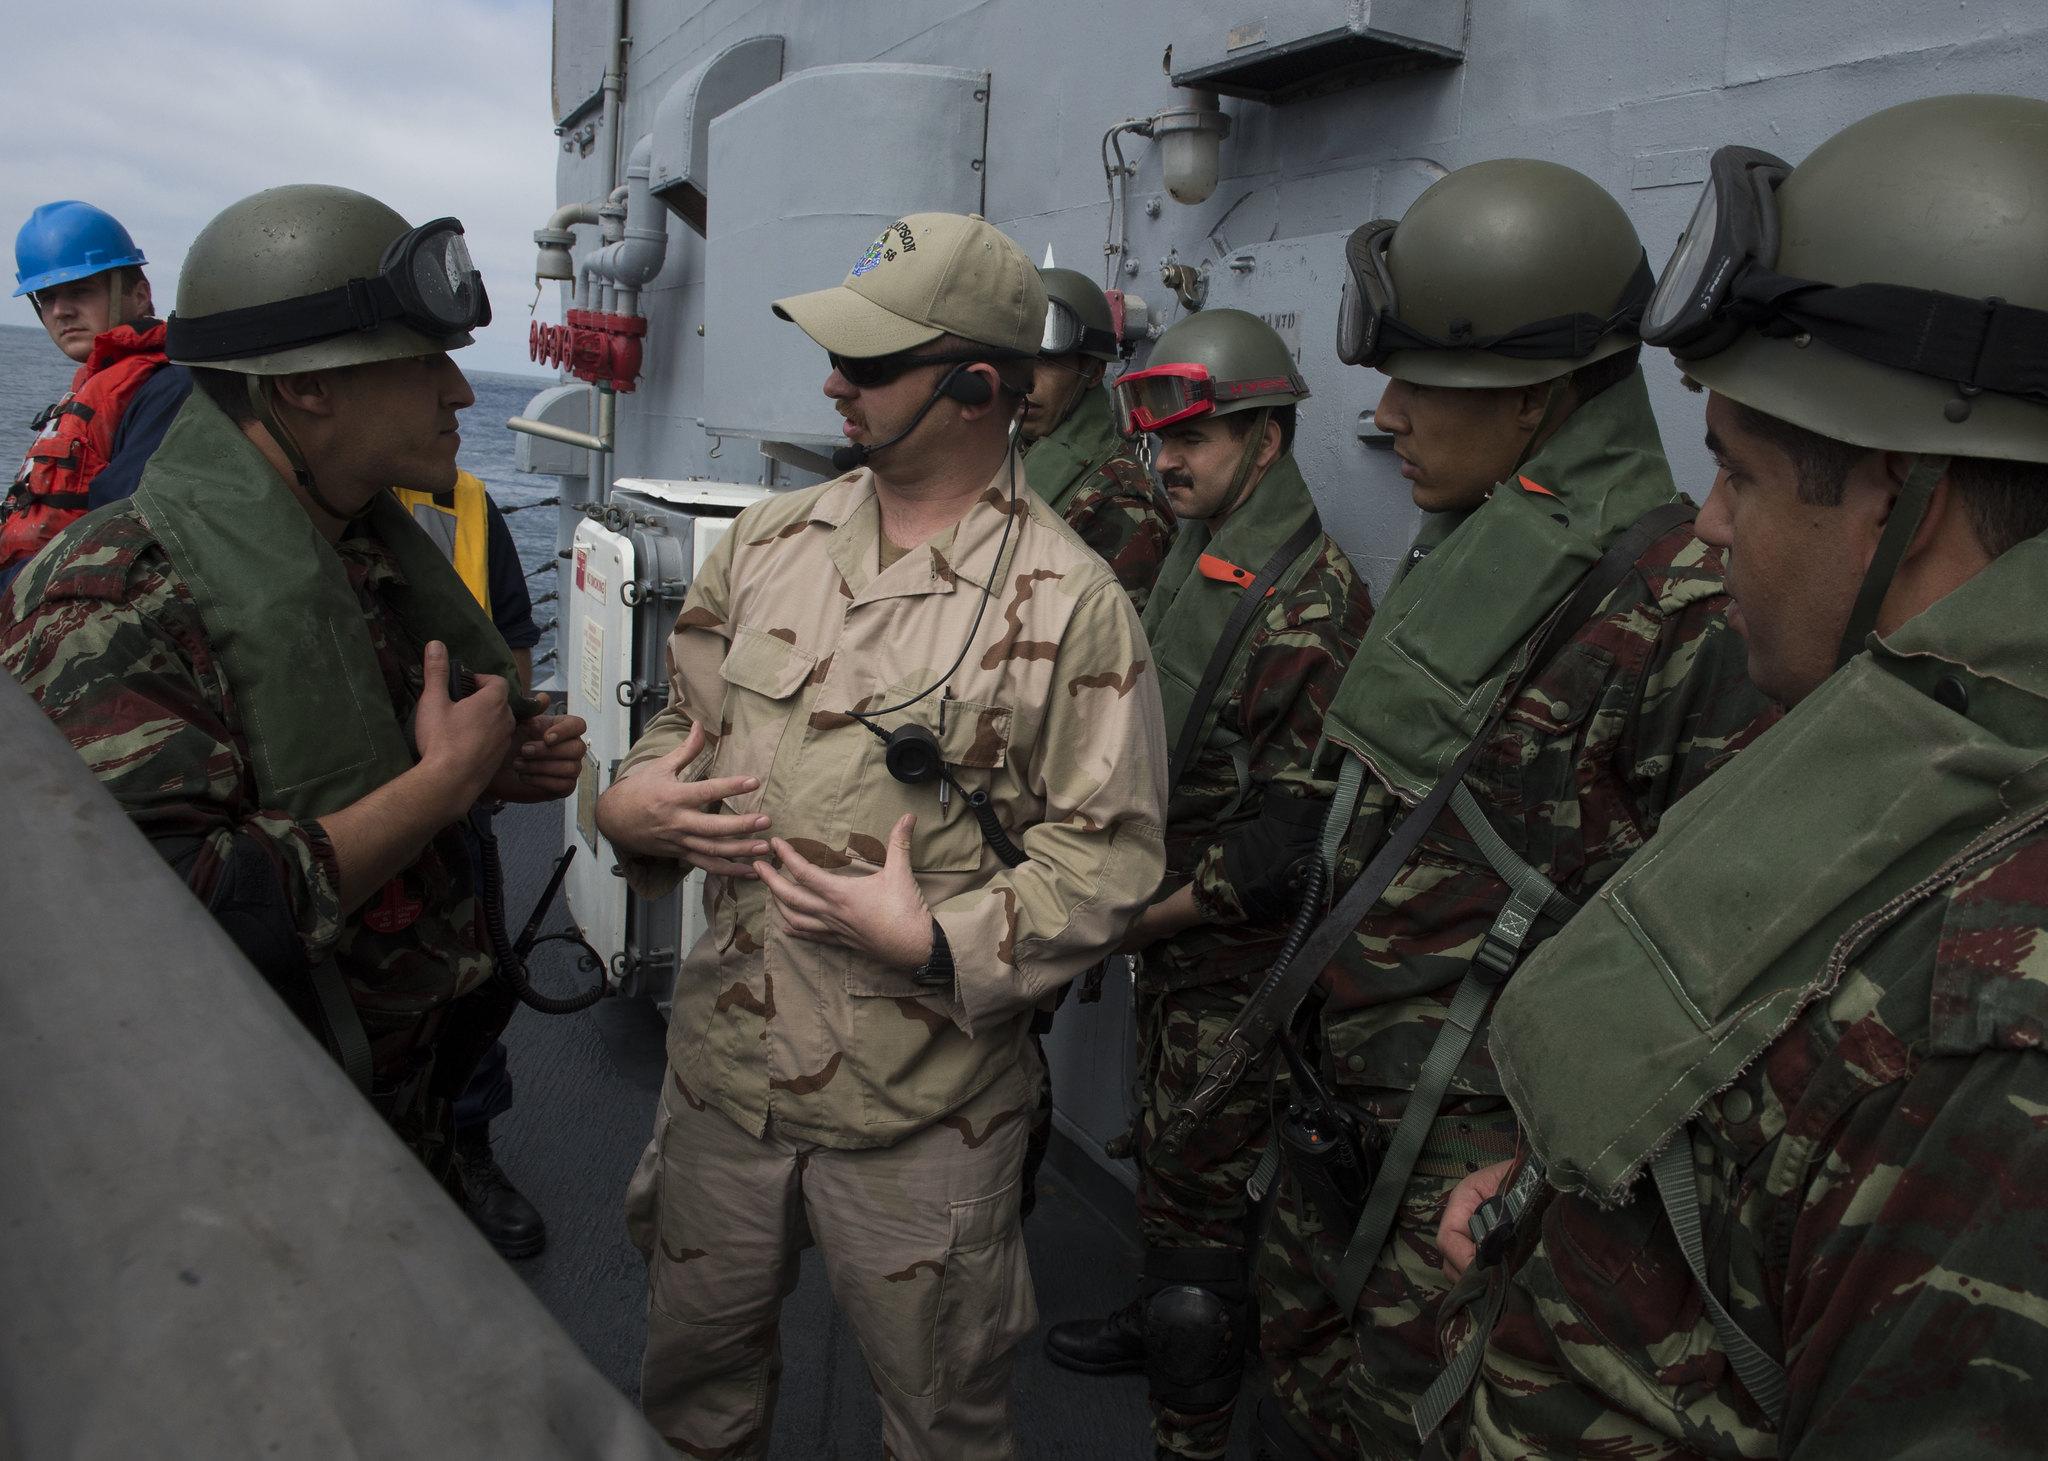 PASSEX 2014-3 : USS Simpson ( FFG56 ) et RMN Hassan II ( 612 ) 12990427904_4438e02b95_k